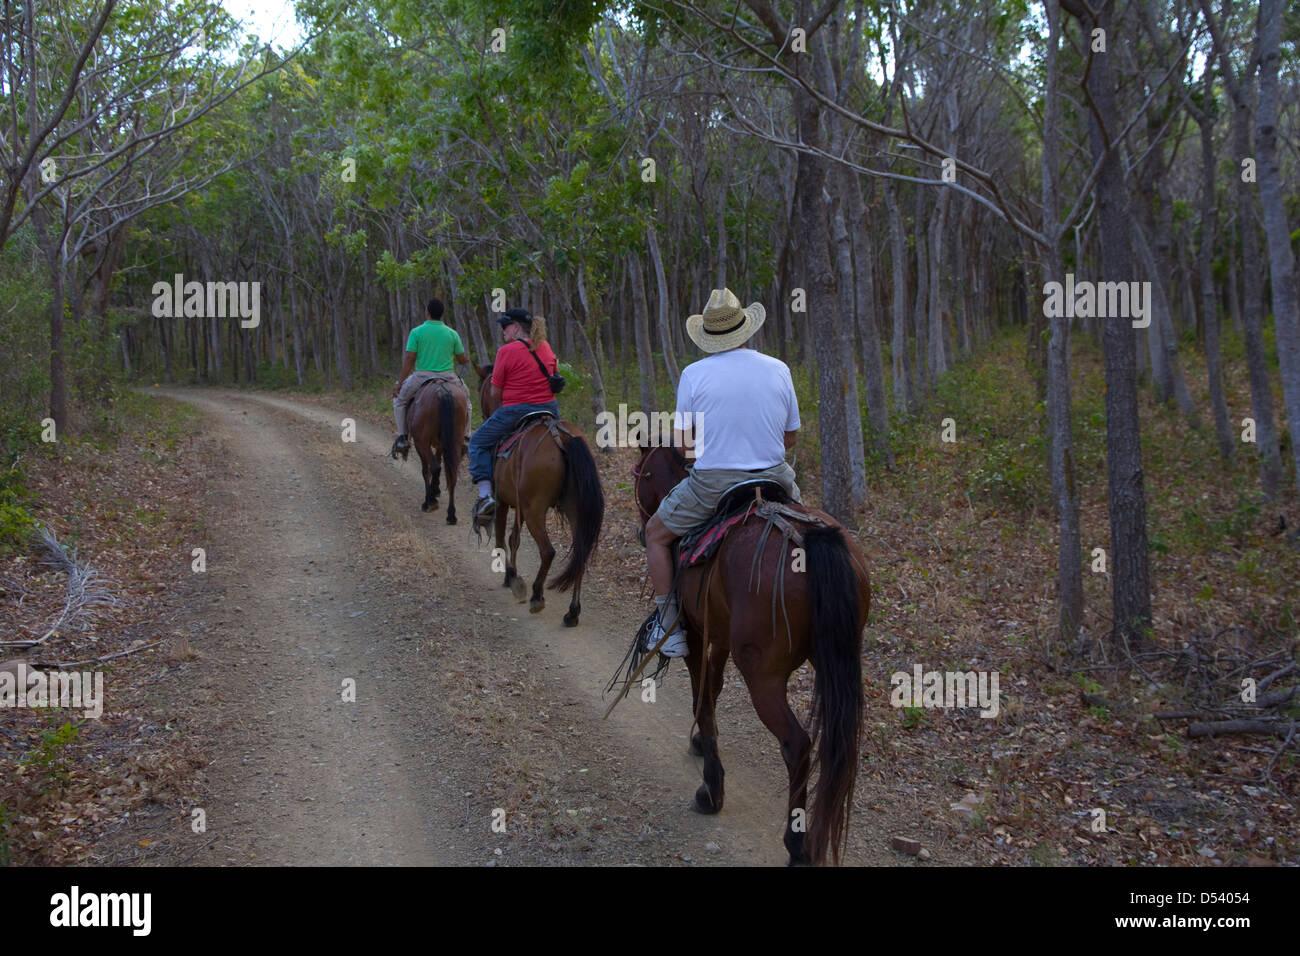 Trail riding through a hardwood forest at Morgan's Rock Hacienda & Ecolodge, Nicaragua - Stock Image